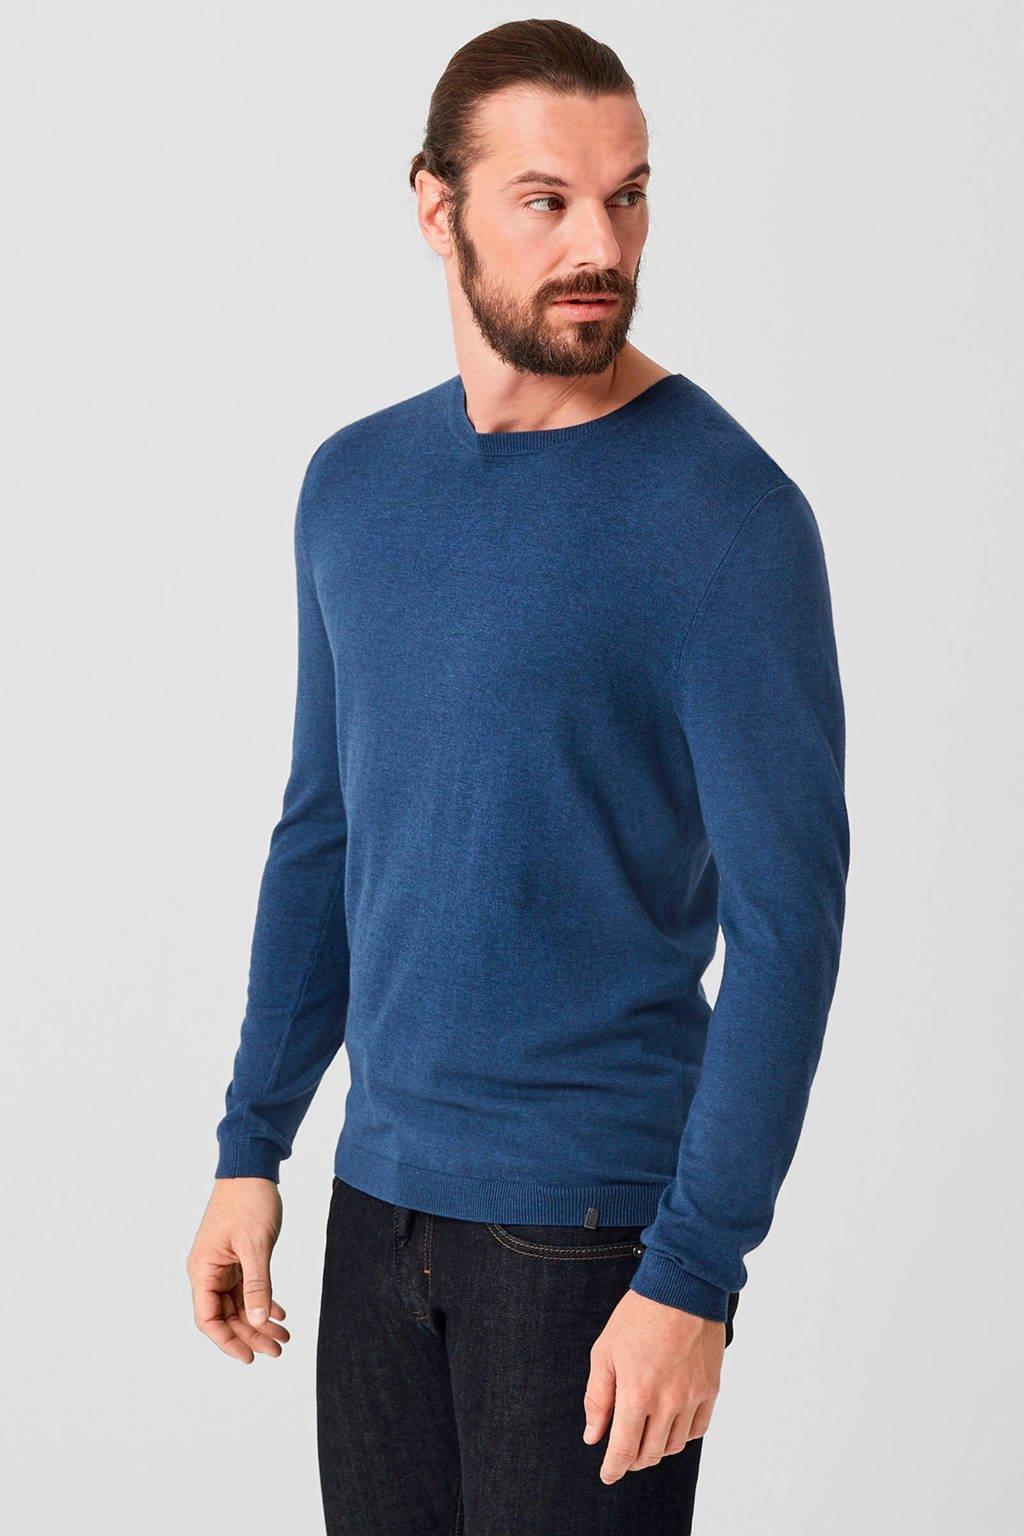 s.Oliver BLACK LABEL trui met wol donkerblauw, Donkerblauw